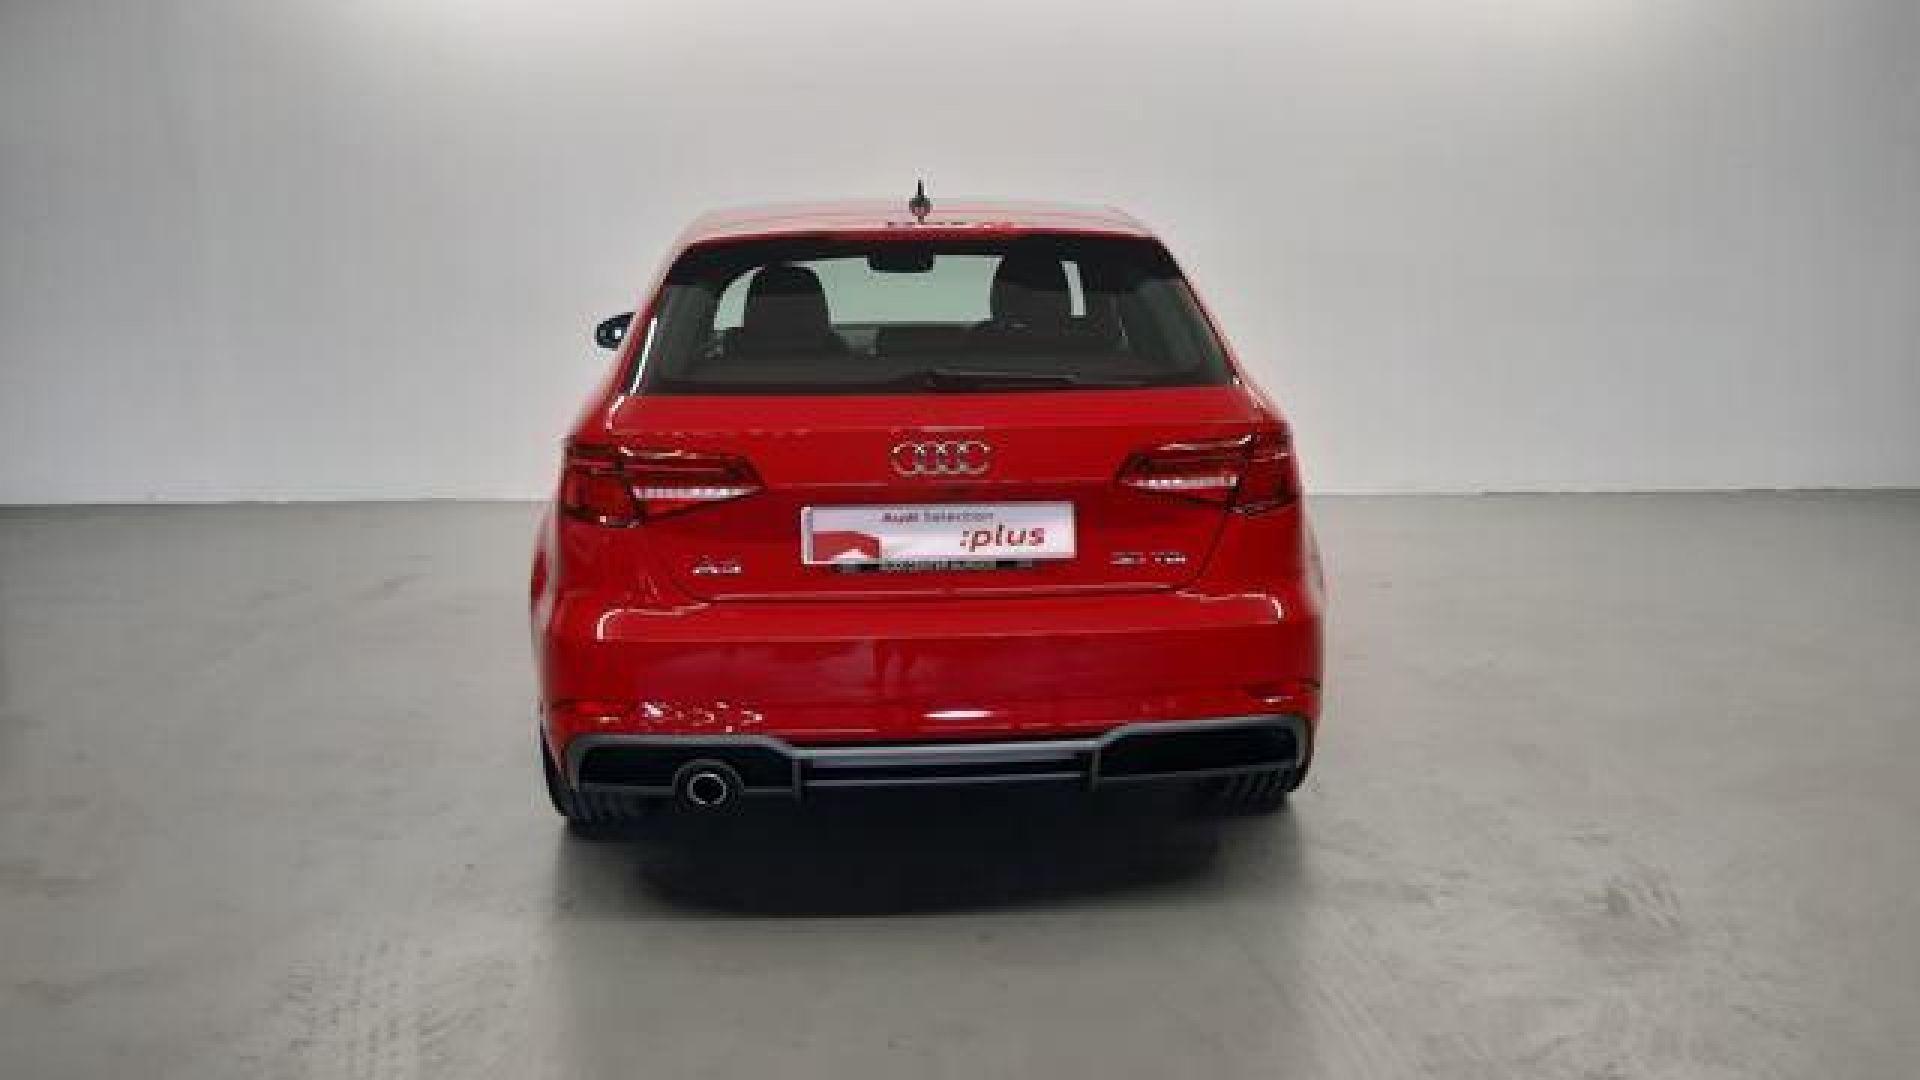 Audi A3 Sportback ALL-IN edion 30 TDI 85kW